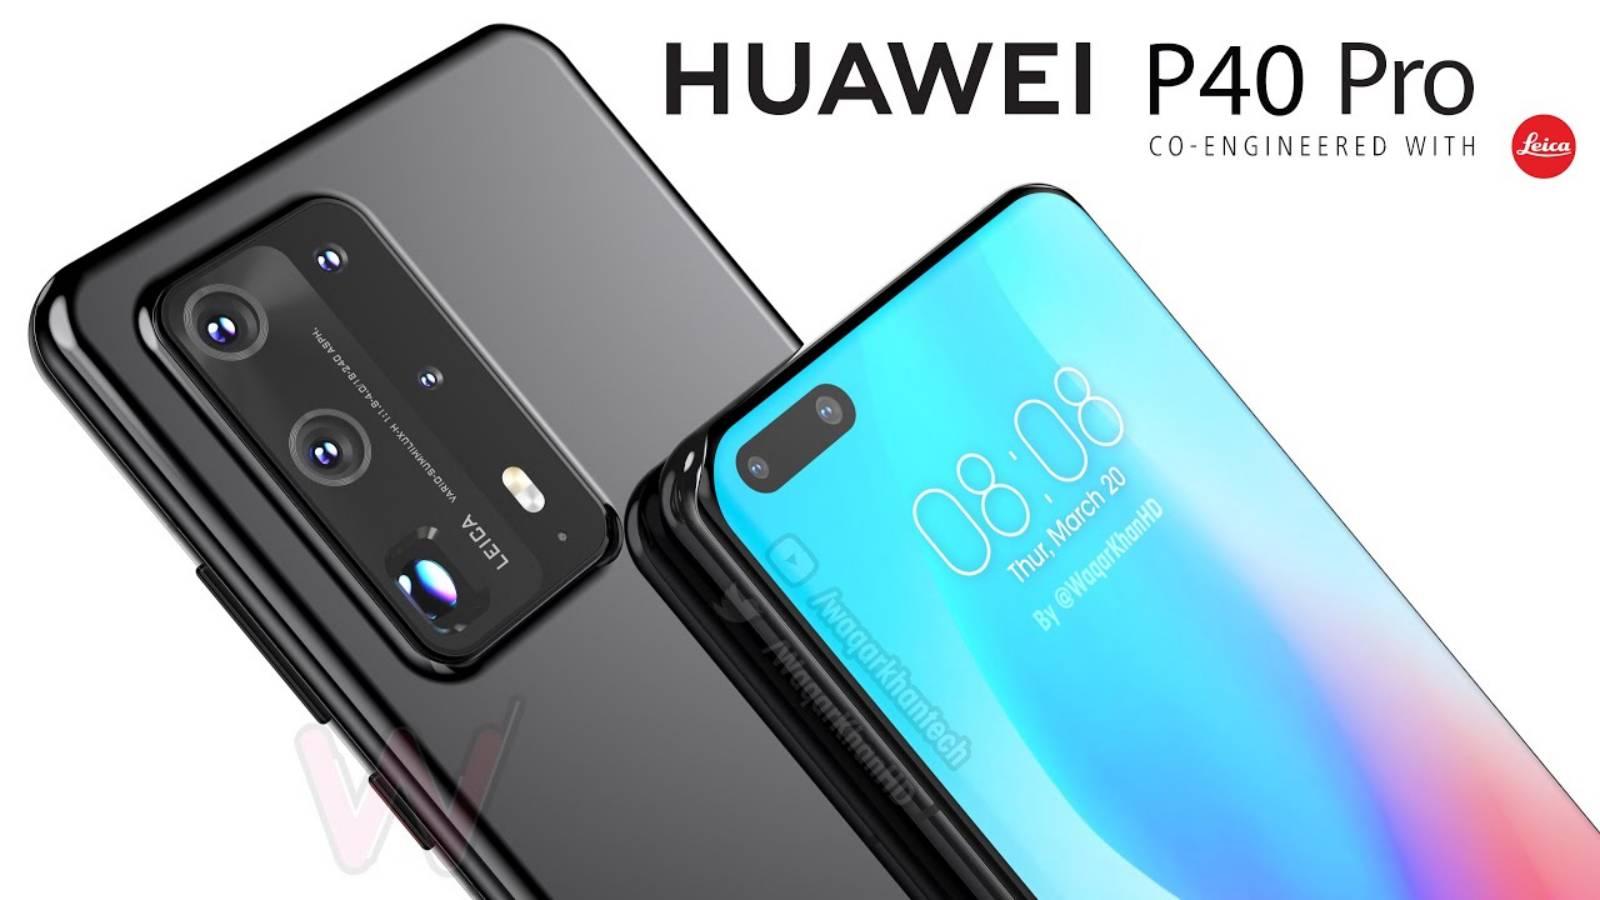 Huawei P40 Pro night mode